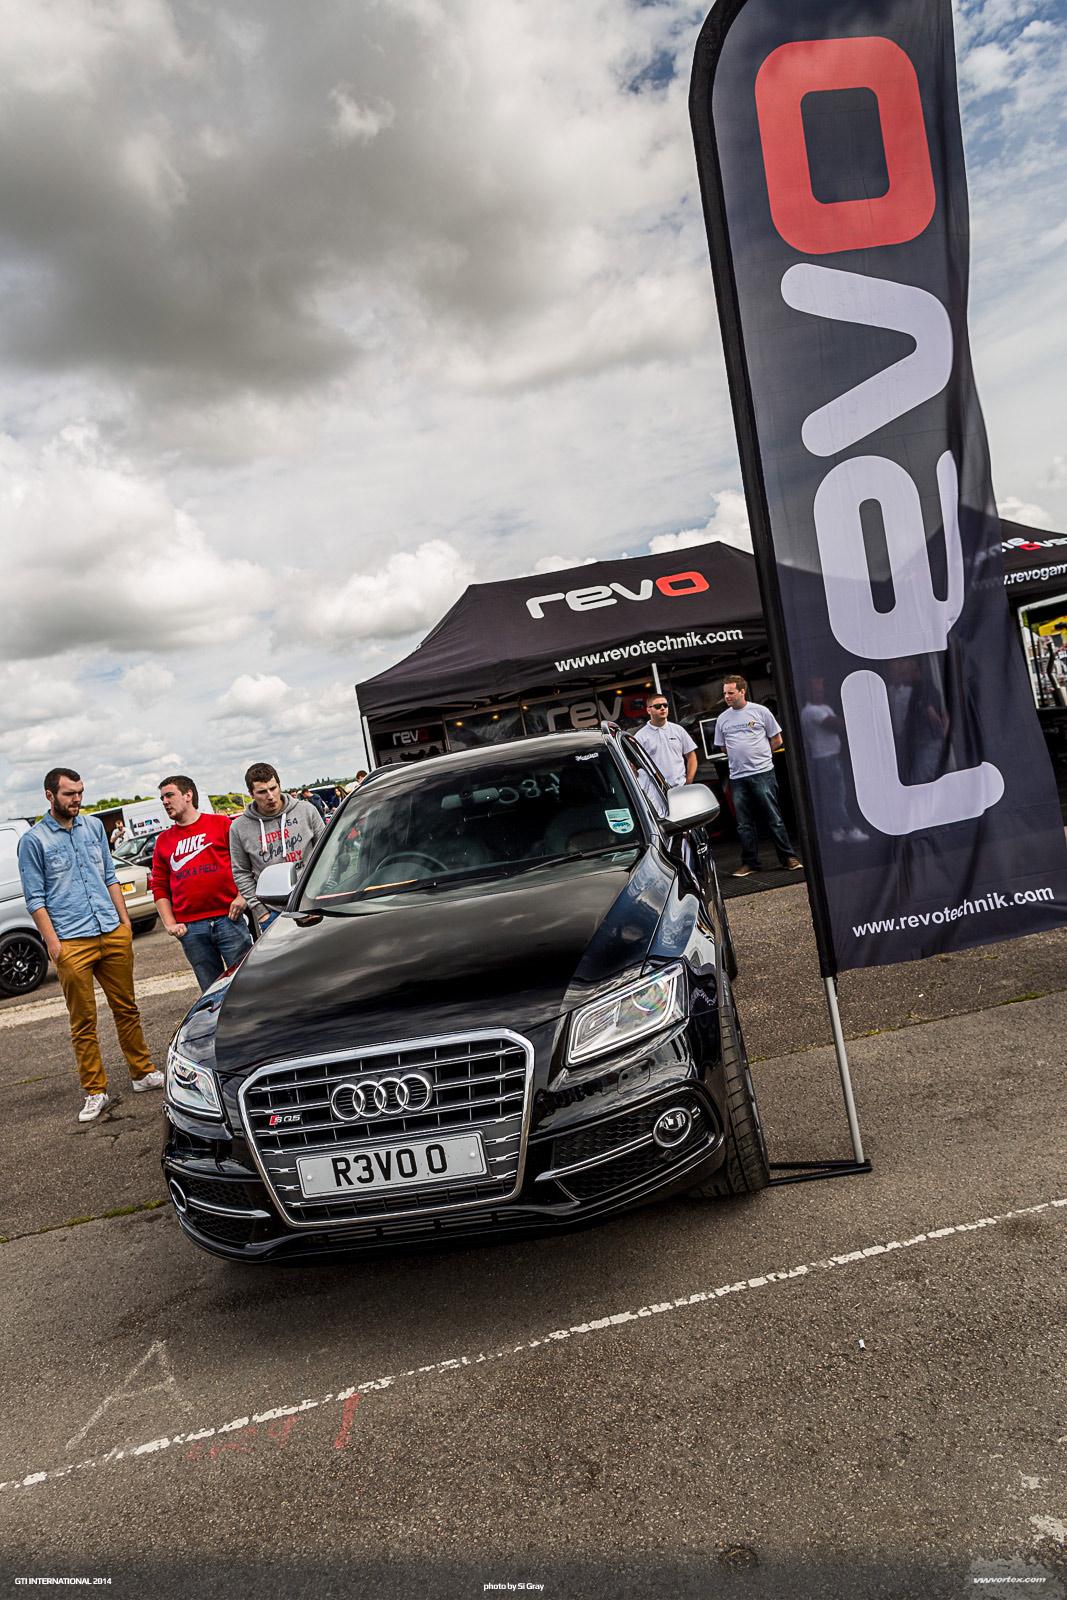 2014 Los Angeles Motor Show Audi 588 110x60 photo